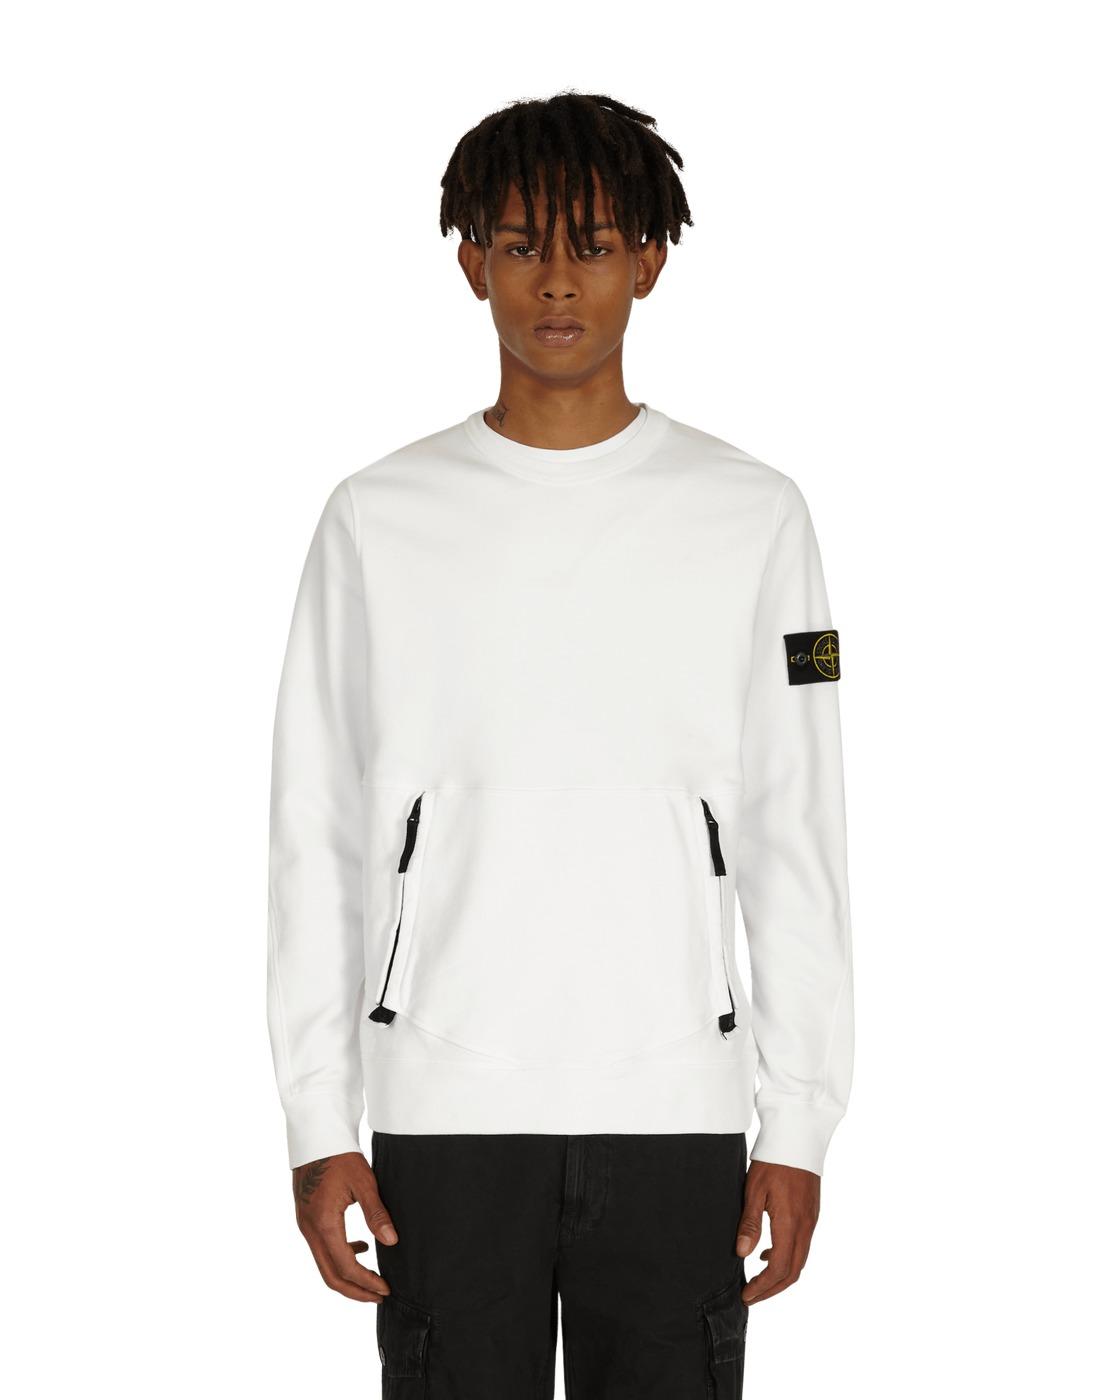 Stone Island Front Pocket Crewneck Sweatshirt White